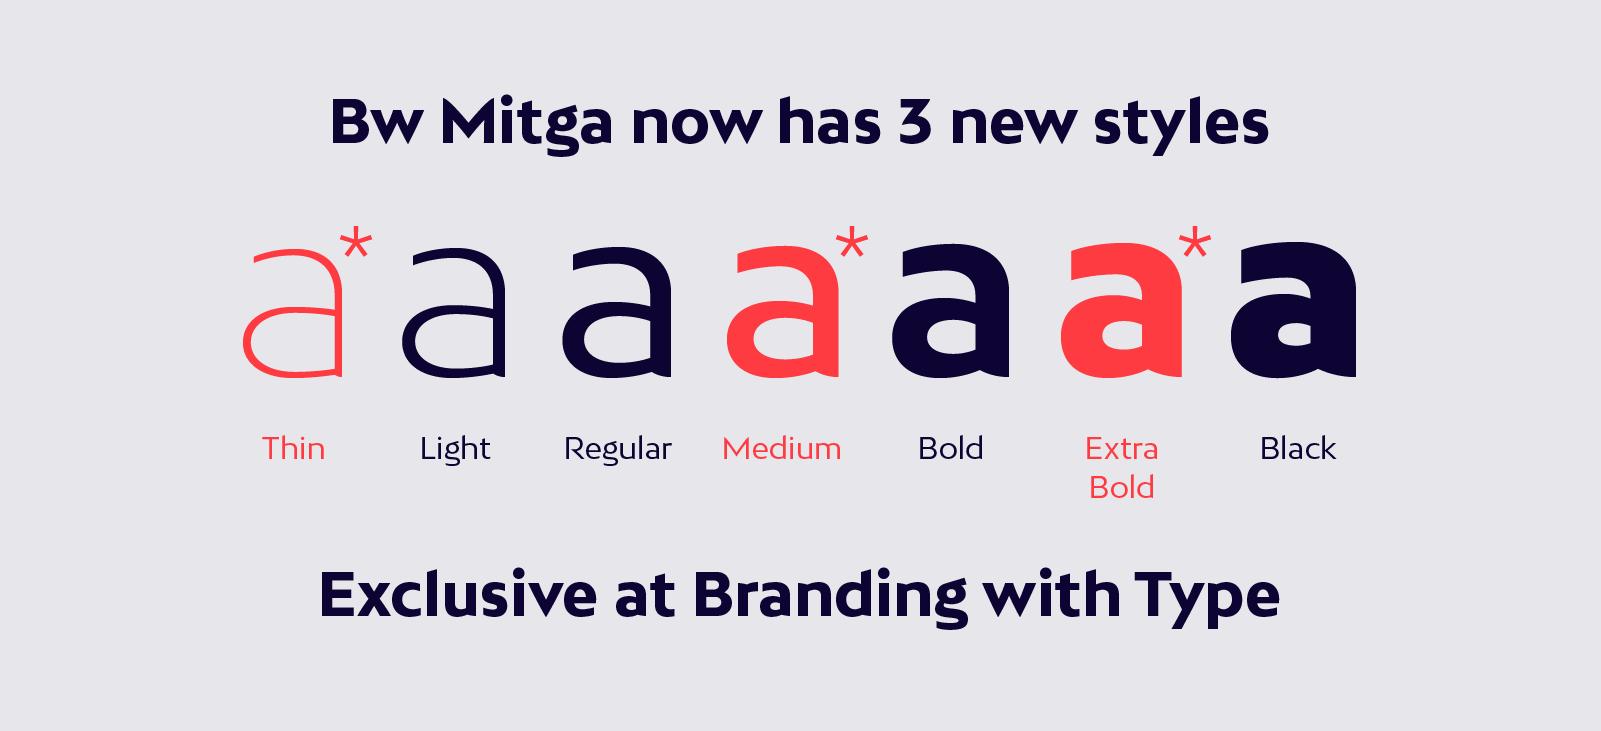 Bw Mitga new styles